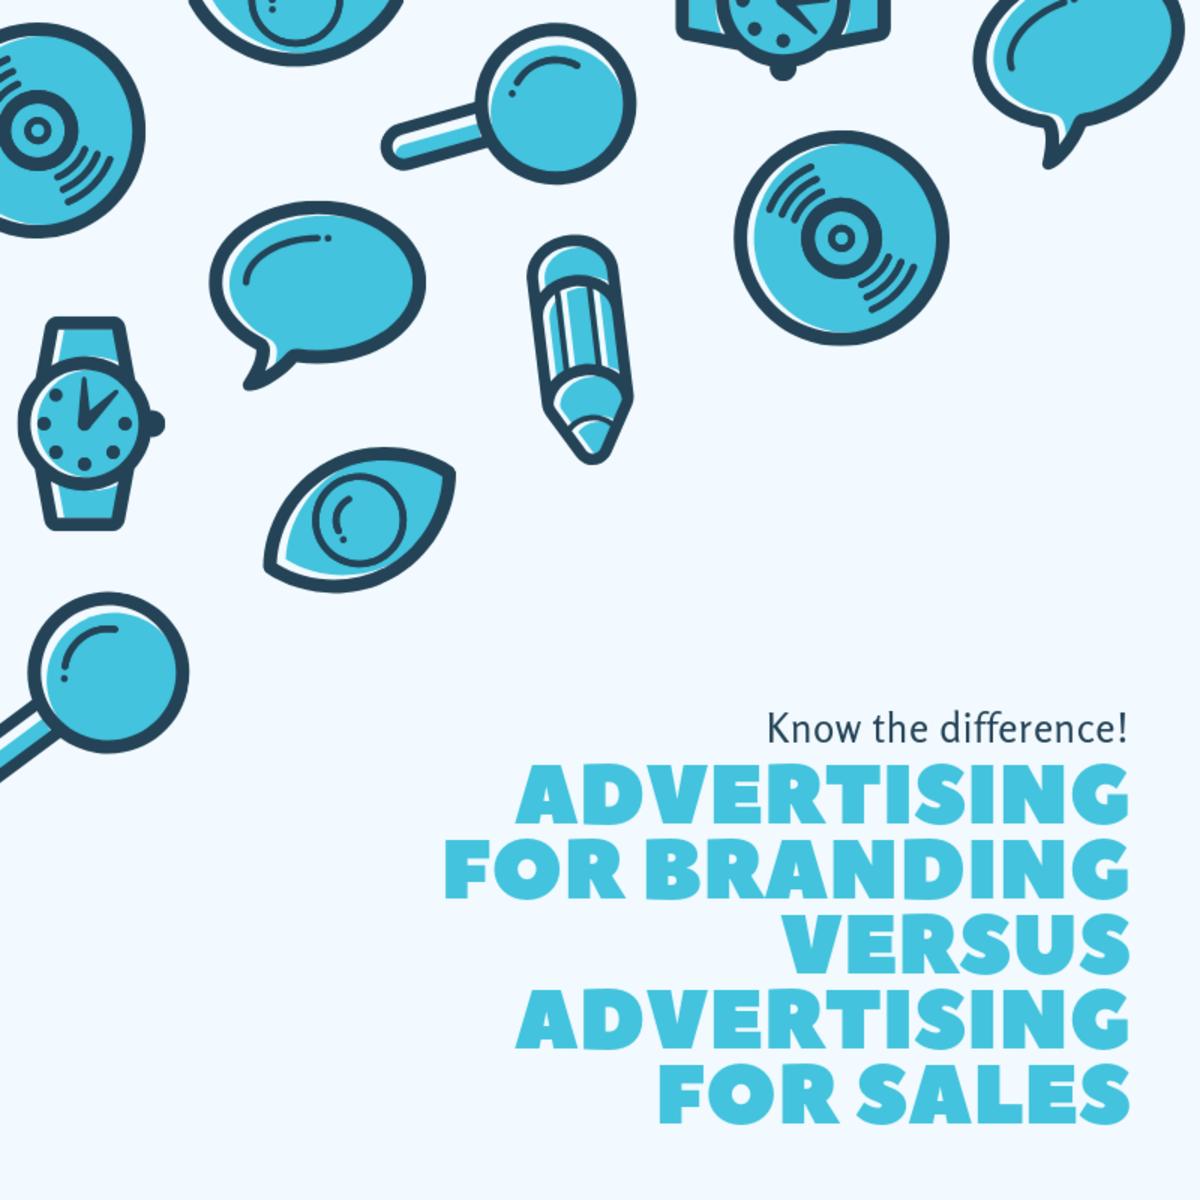 Advertising for Branding Versus Advertising for Sales